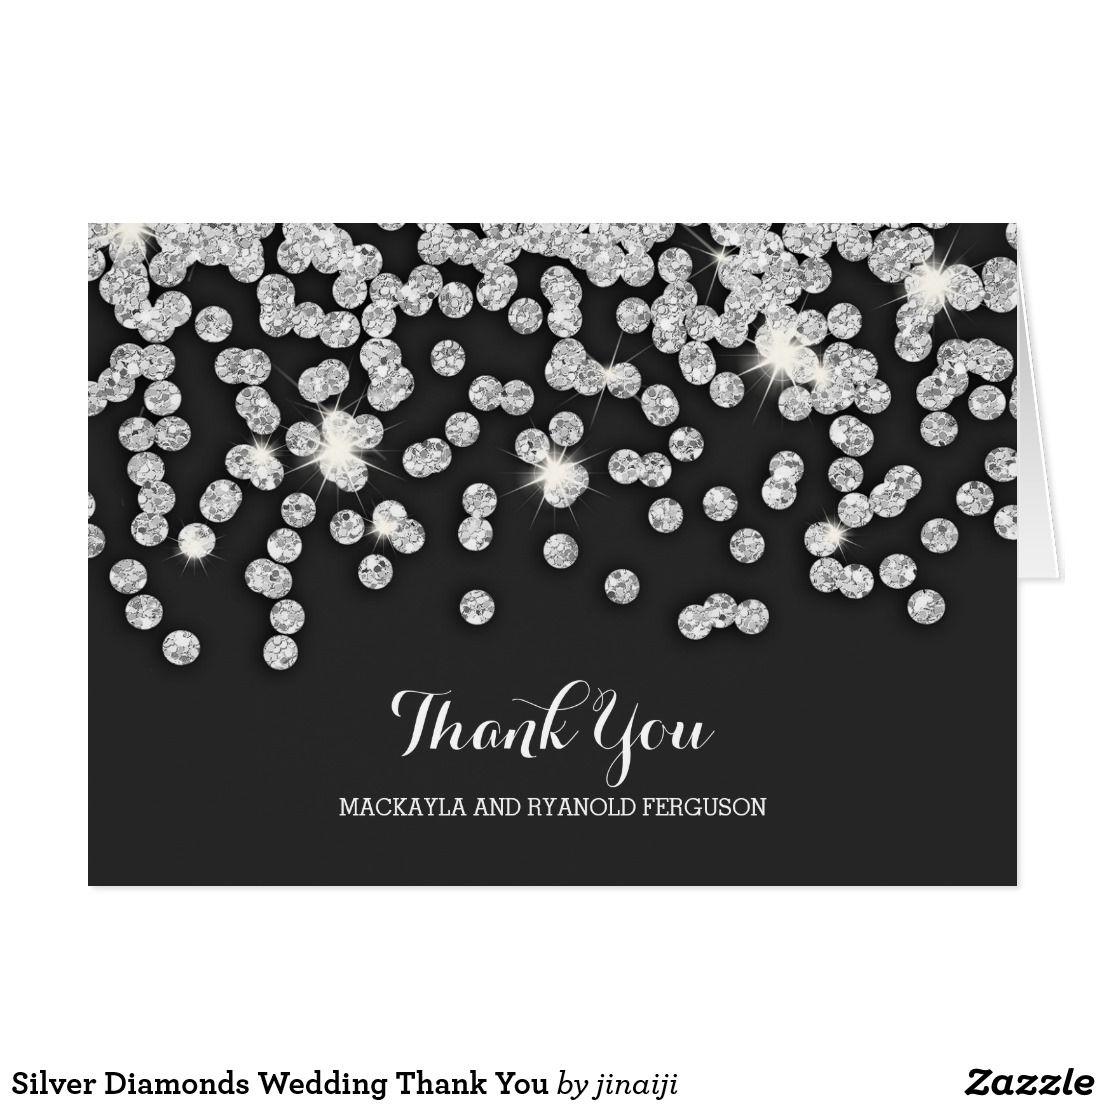 Silver Diamonds Wedding Thank You Zazzle Com Wedding Thank You